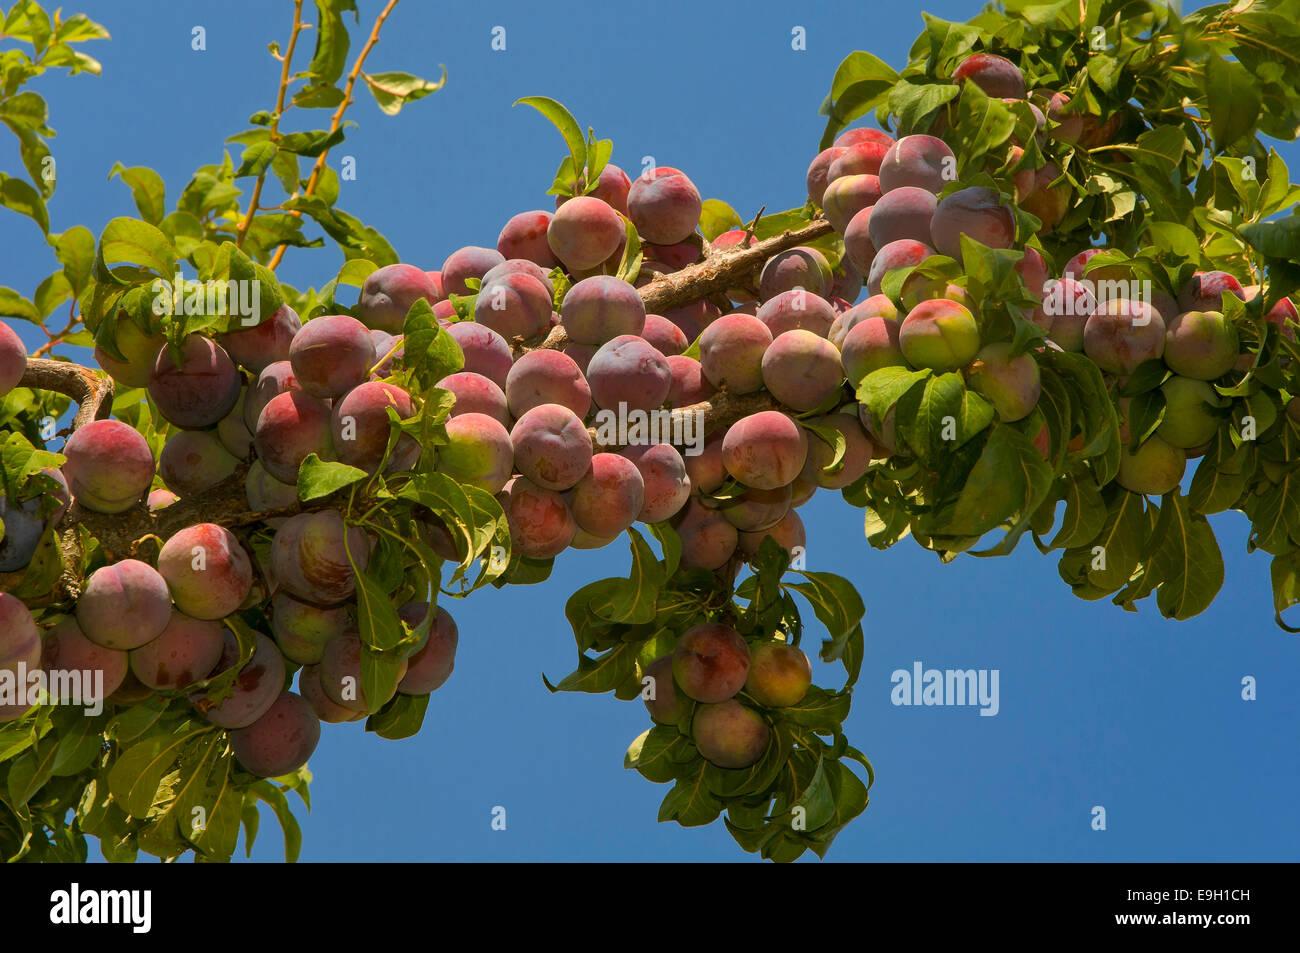 Plum Tree Fruits Stock Photos & Plum Tree Fruits Stock Images - Alamy